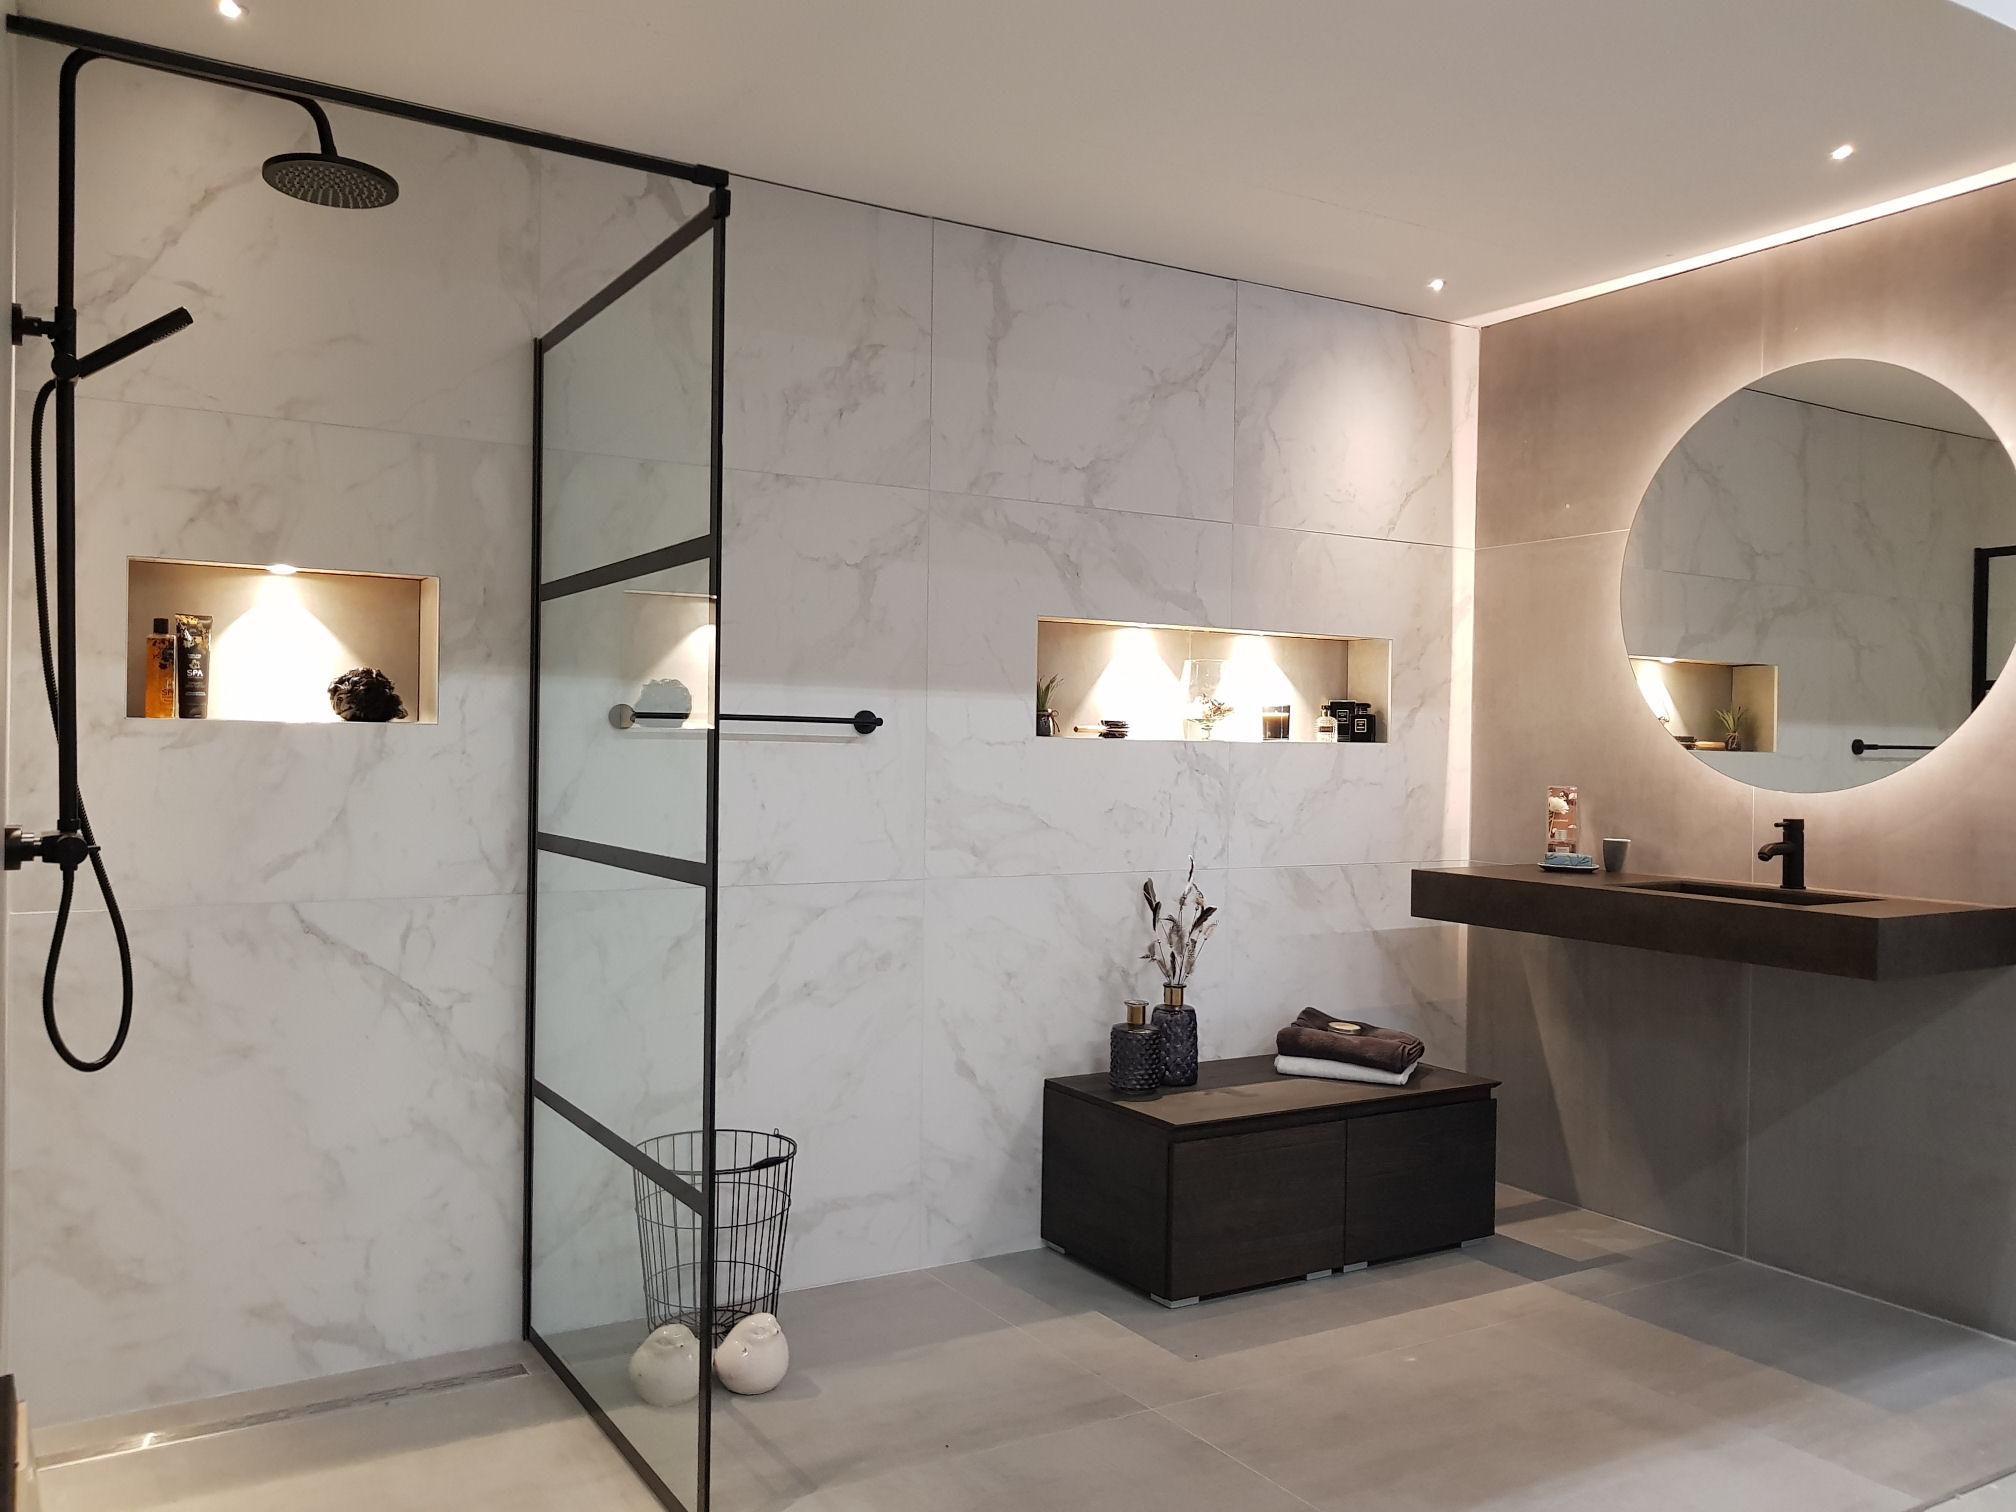 Ronde Spiegel Badkamer : Ronde spiegels badkamerhuis